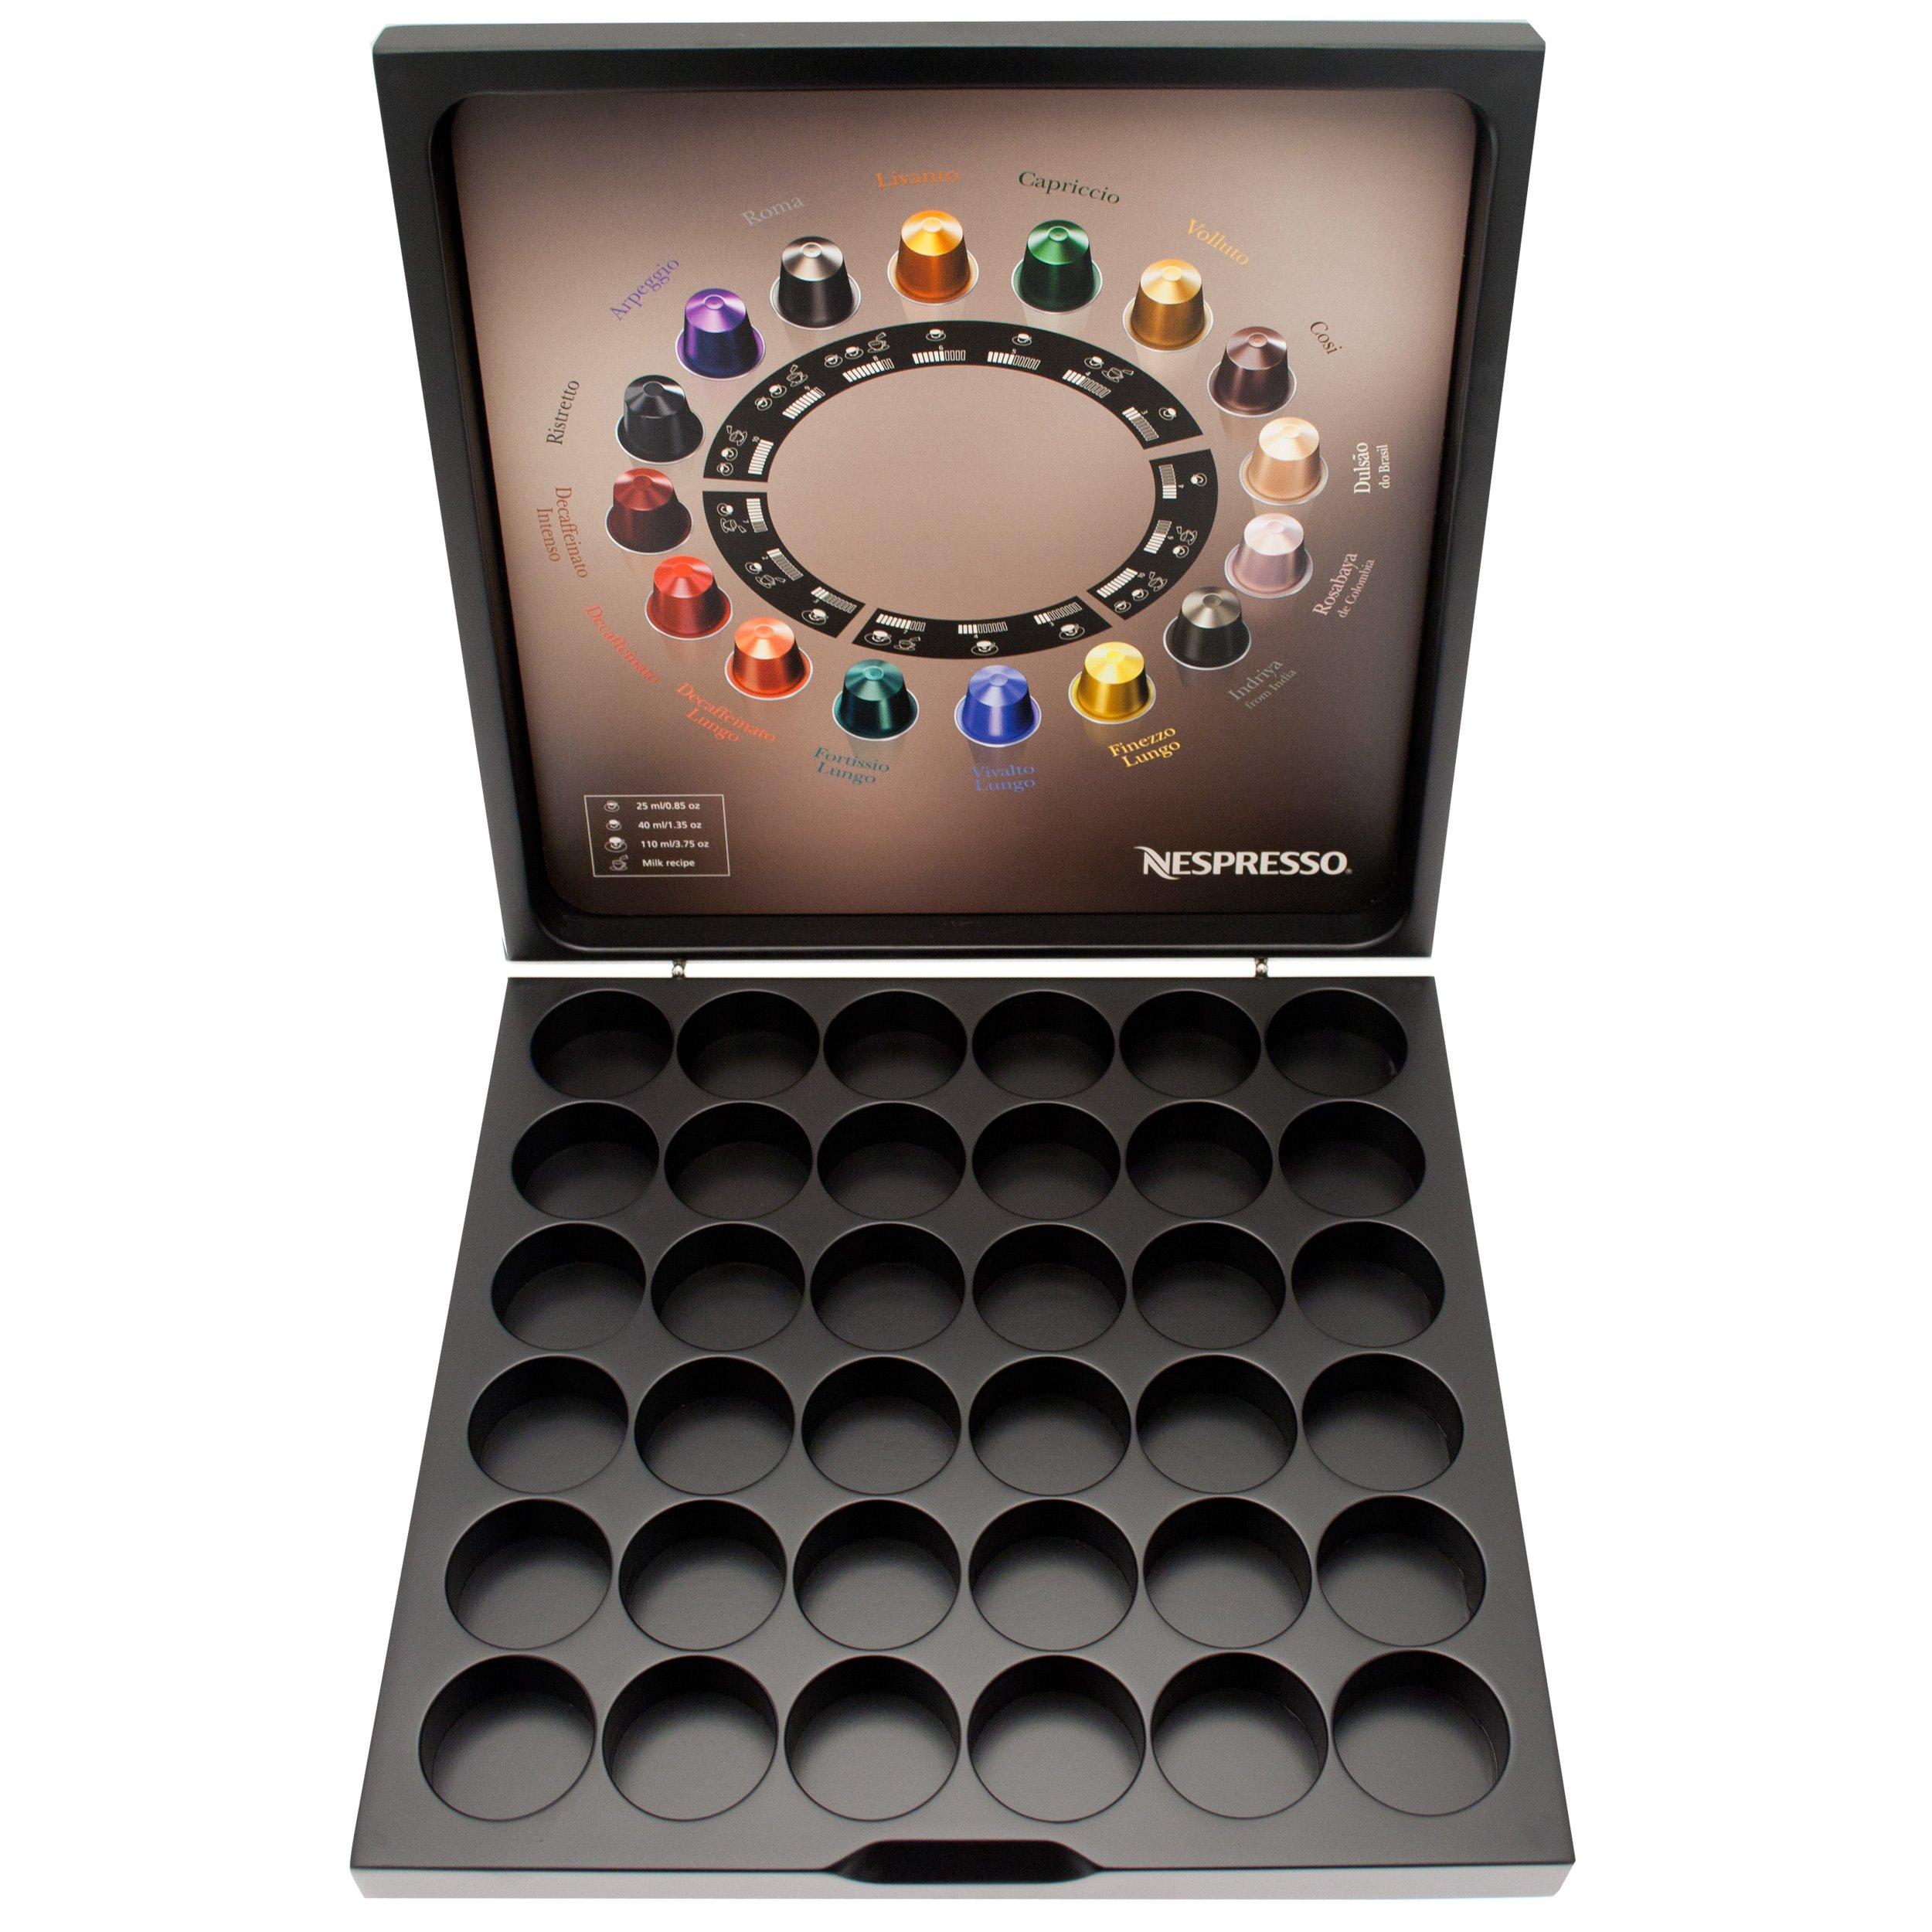 NESPRESSO Capsules Discovery Box EMPTY